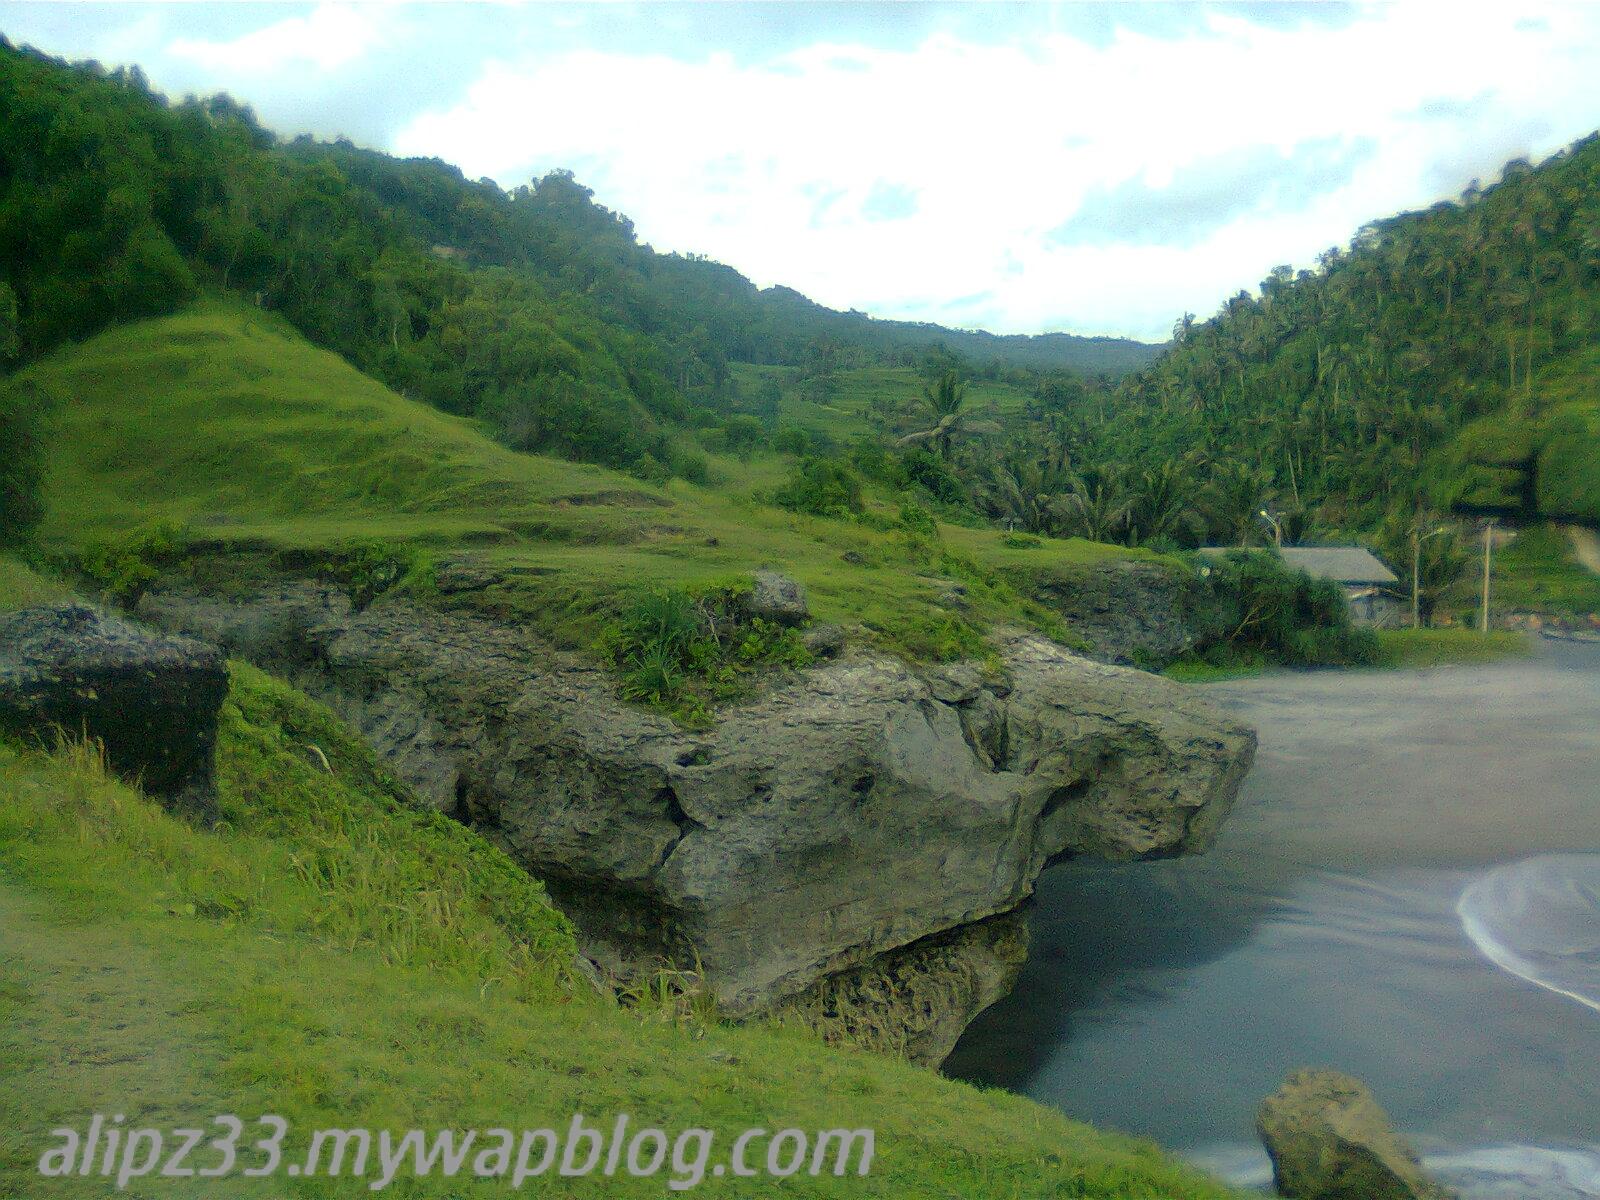 Bukit hijau belakang pantai tawang katipugal pacitan